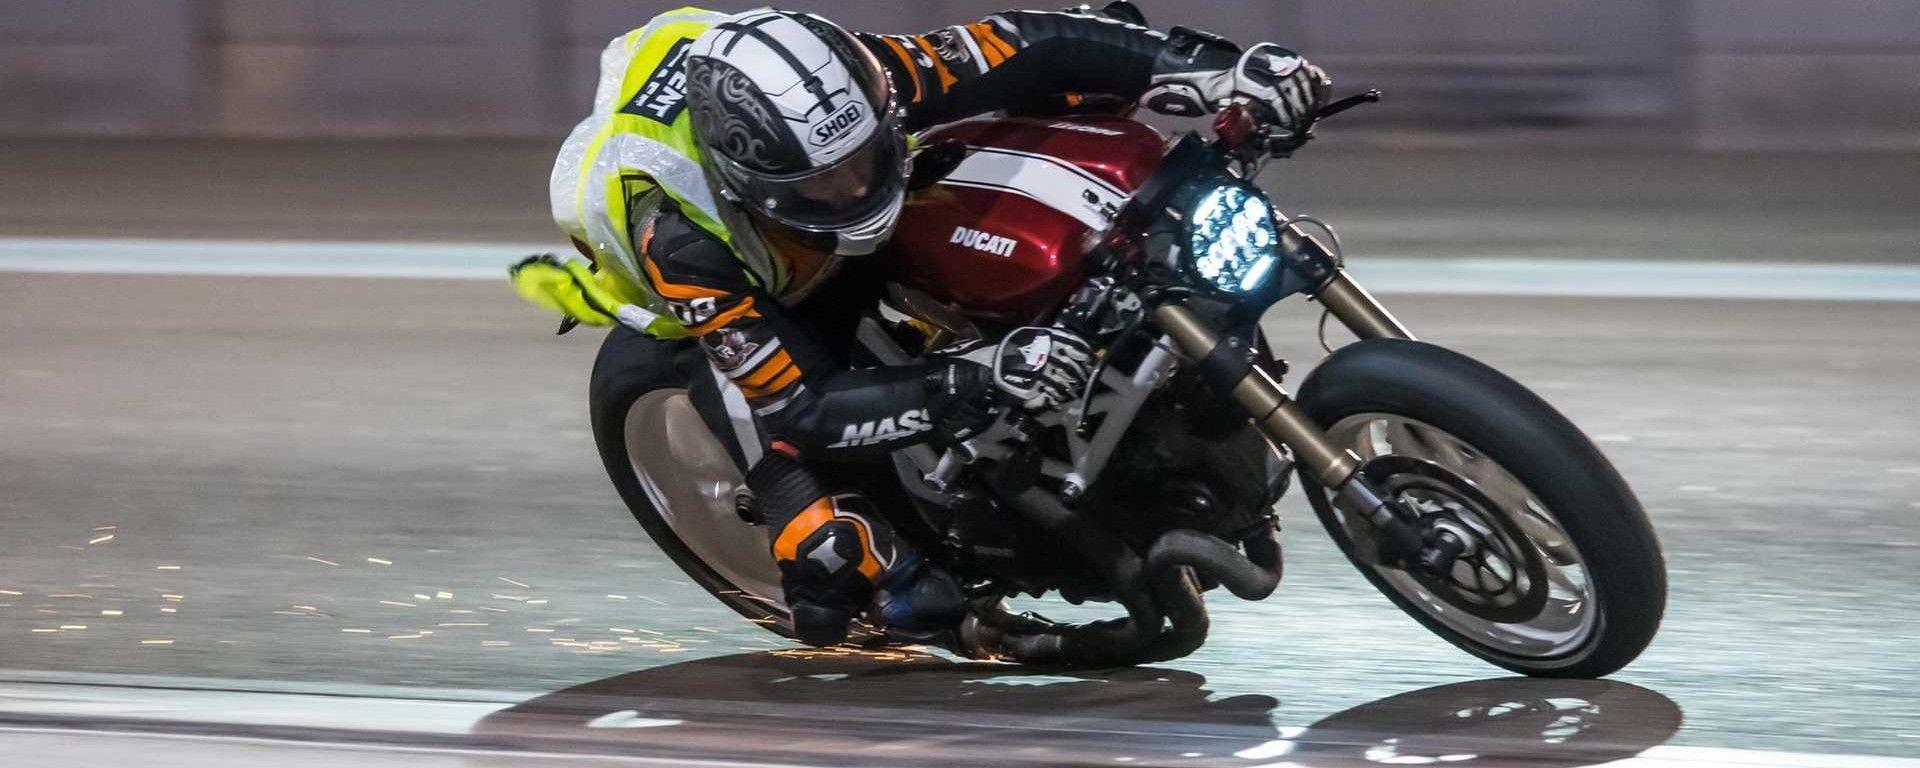 Ducati Monstrosity, la Café Racer da pista